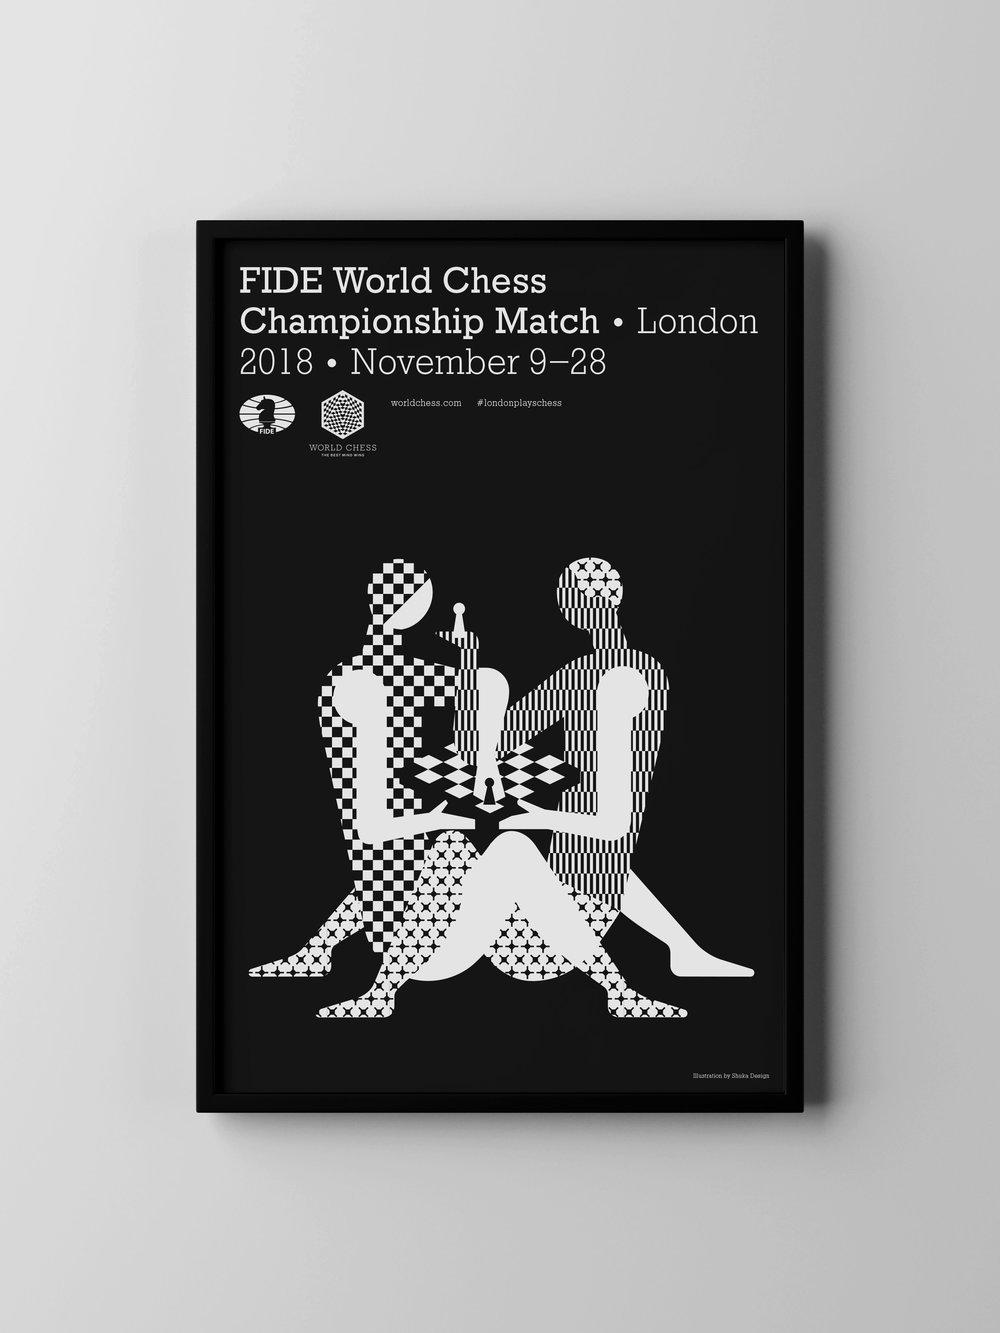 Логотип чемпионата мира по шахматам становится темой дня. В мире. - Попробуем написать текст на русском!commodo tellus risus, non commodo risus imperdiet.Learn more ➝